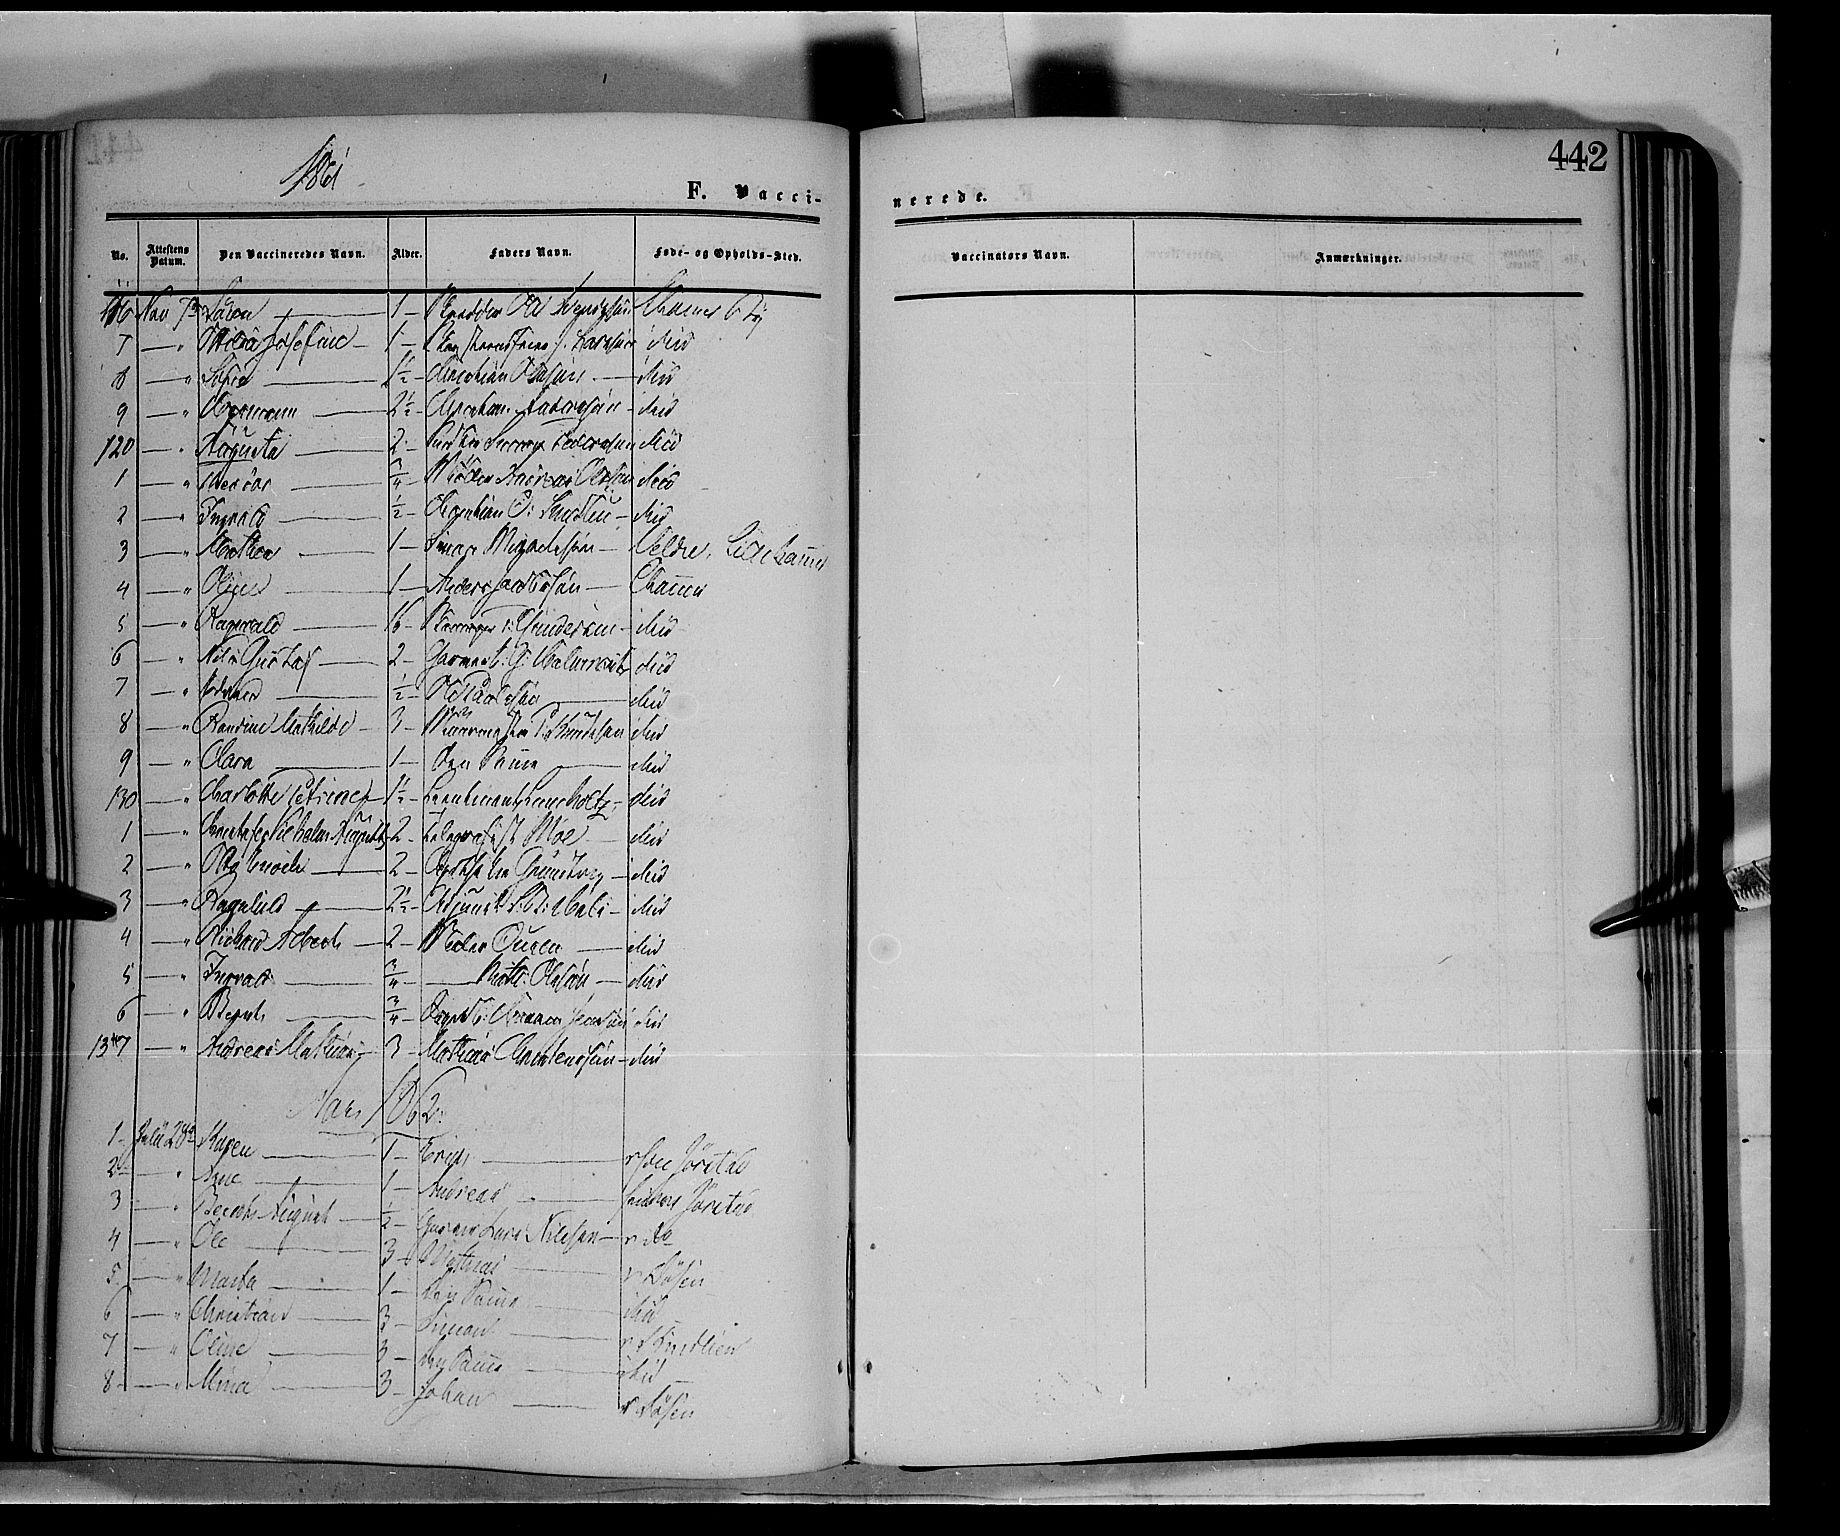 SAH, Fåberg prestekontor, Ministerialbok nr. 6B, 1855-1867, s. 442